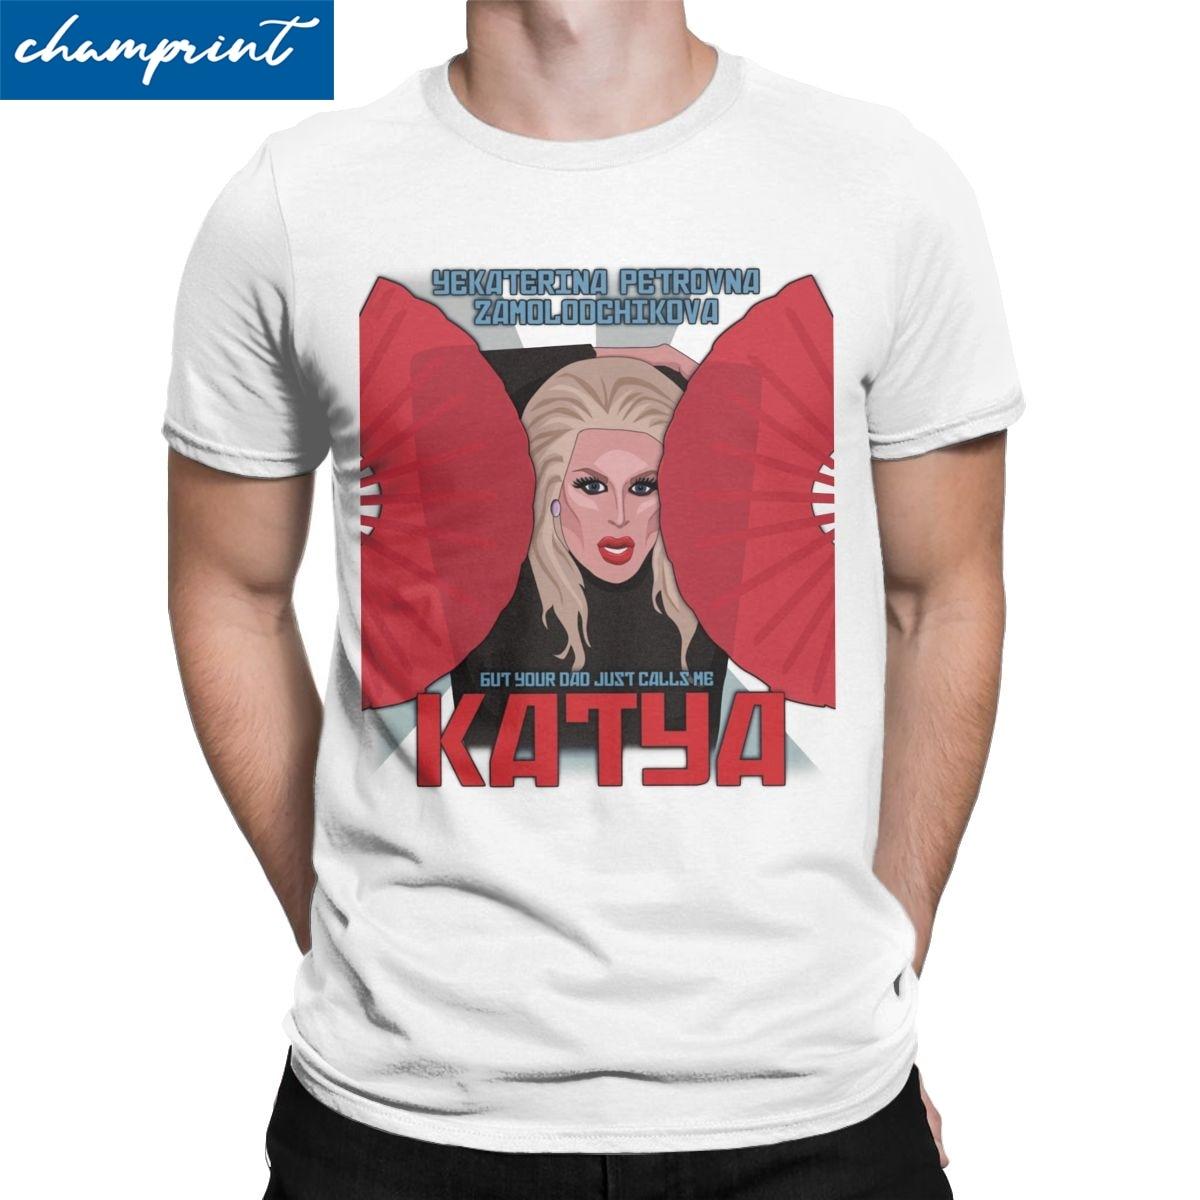 Katya zamolodchikova seu pai apenas me chama katya camiseta rpdr rpdr rpdr rpdr rsvp rsvp rsvp rsvp rsvp